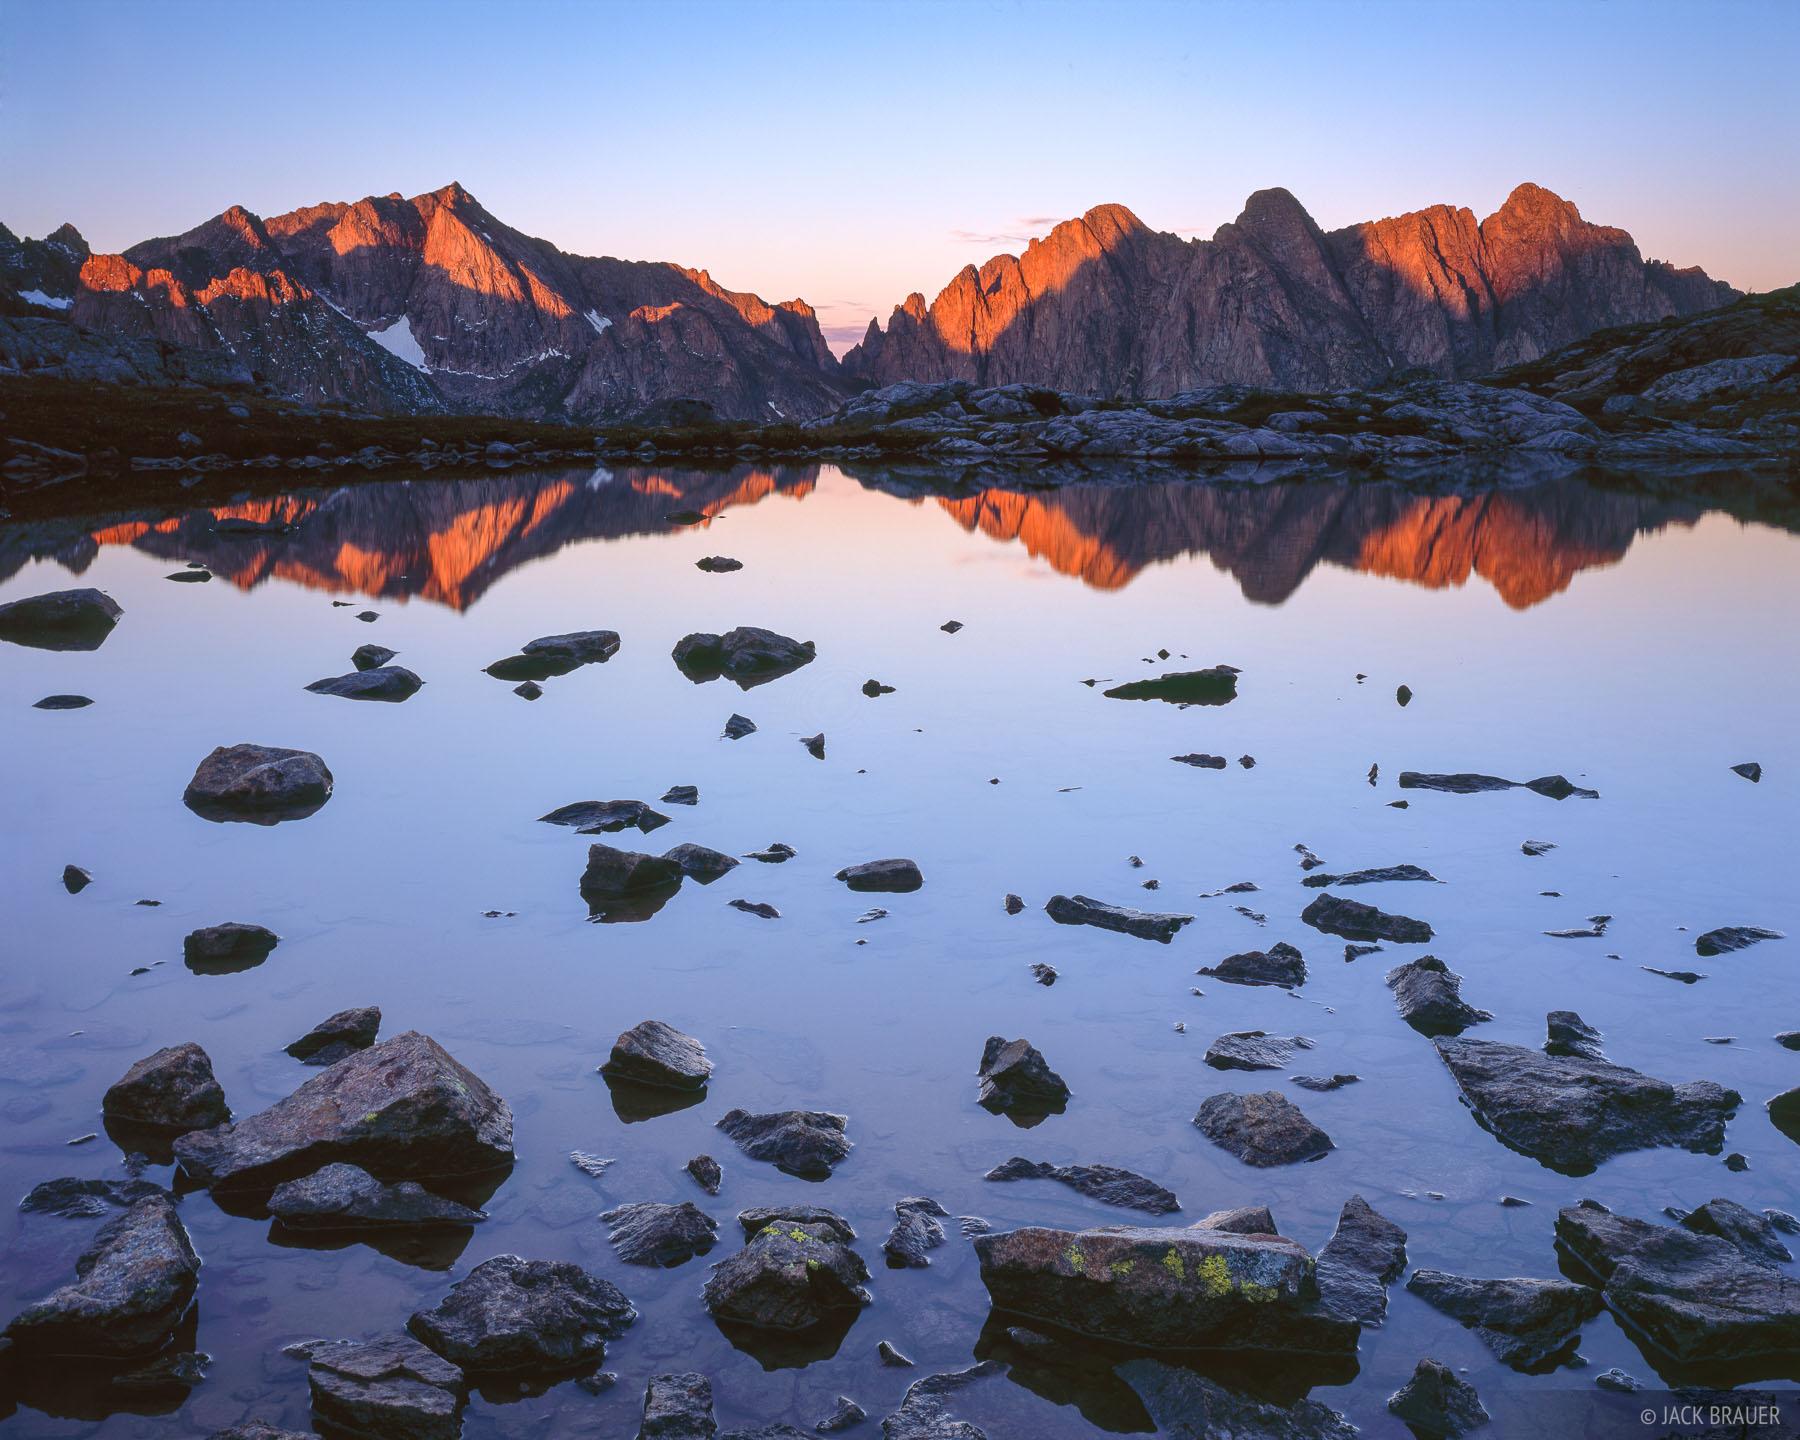 Sunrise light on Mt. Eolus and the Needle Mountains - September.